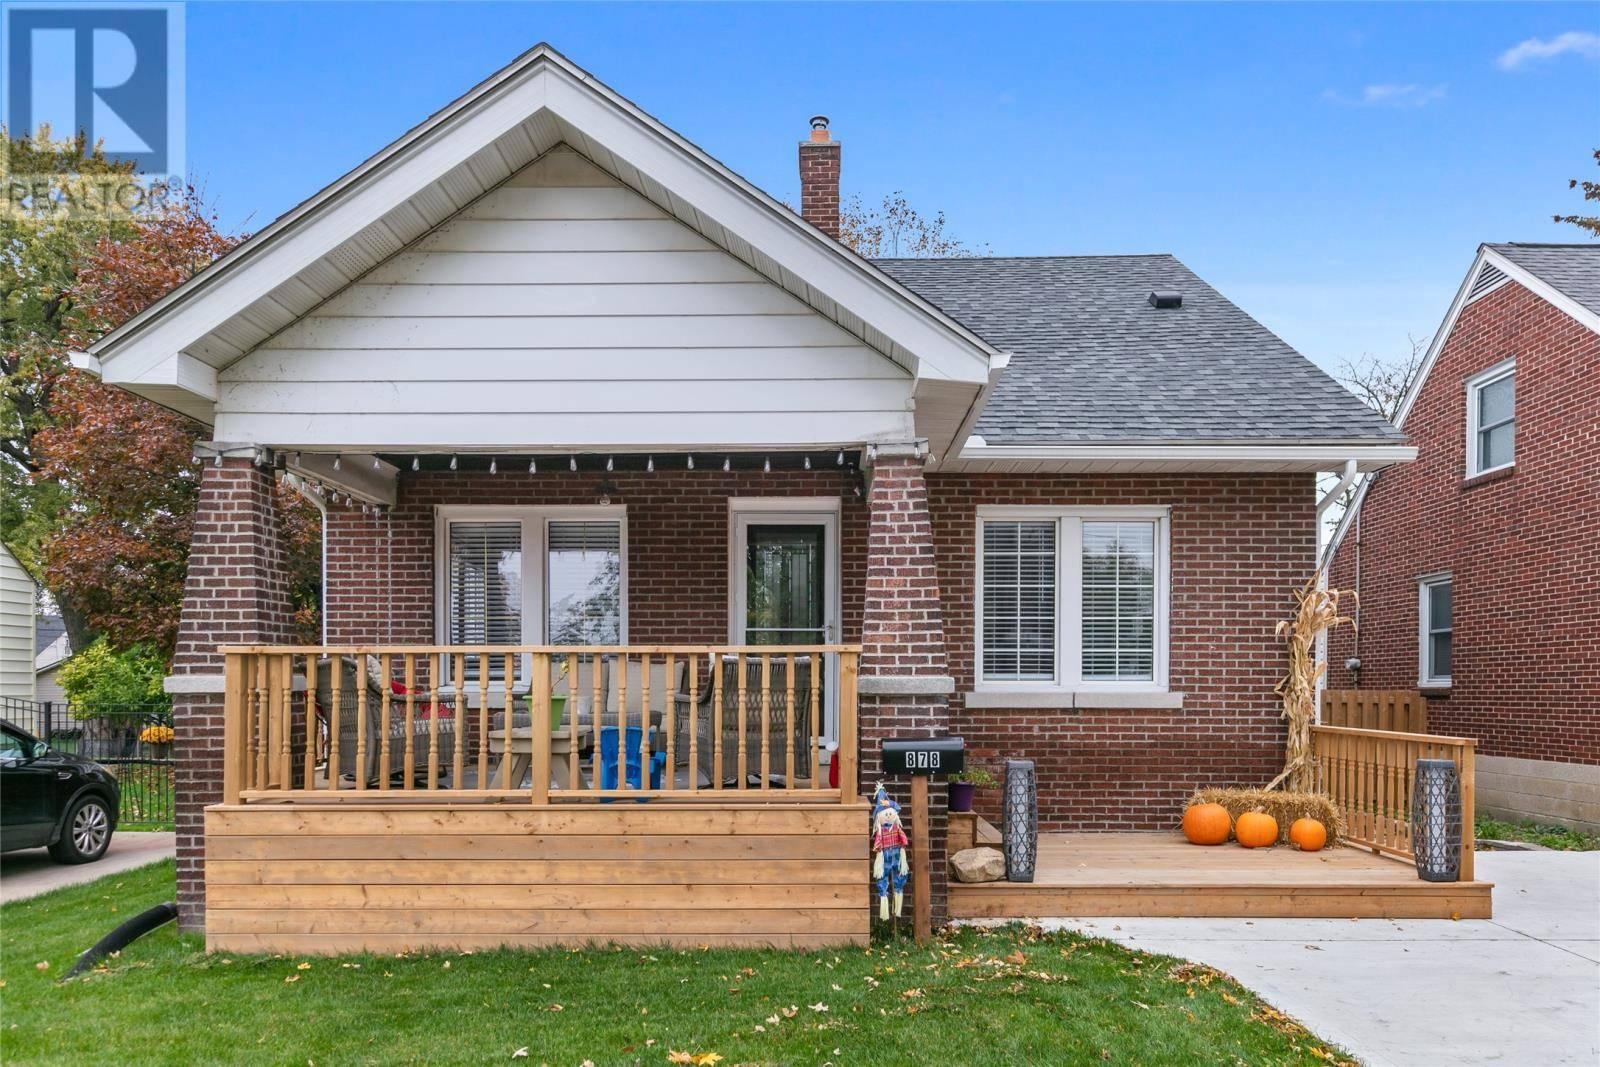 House for sale at 878 Glidden  Windsor Ontario - MLS: 19027602